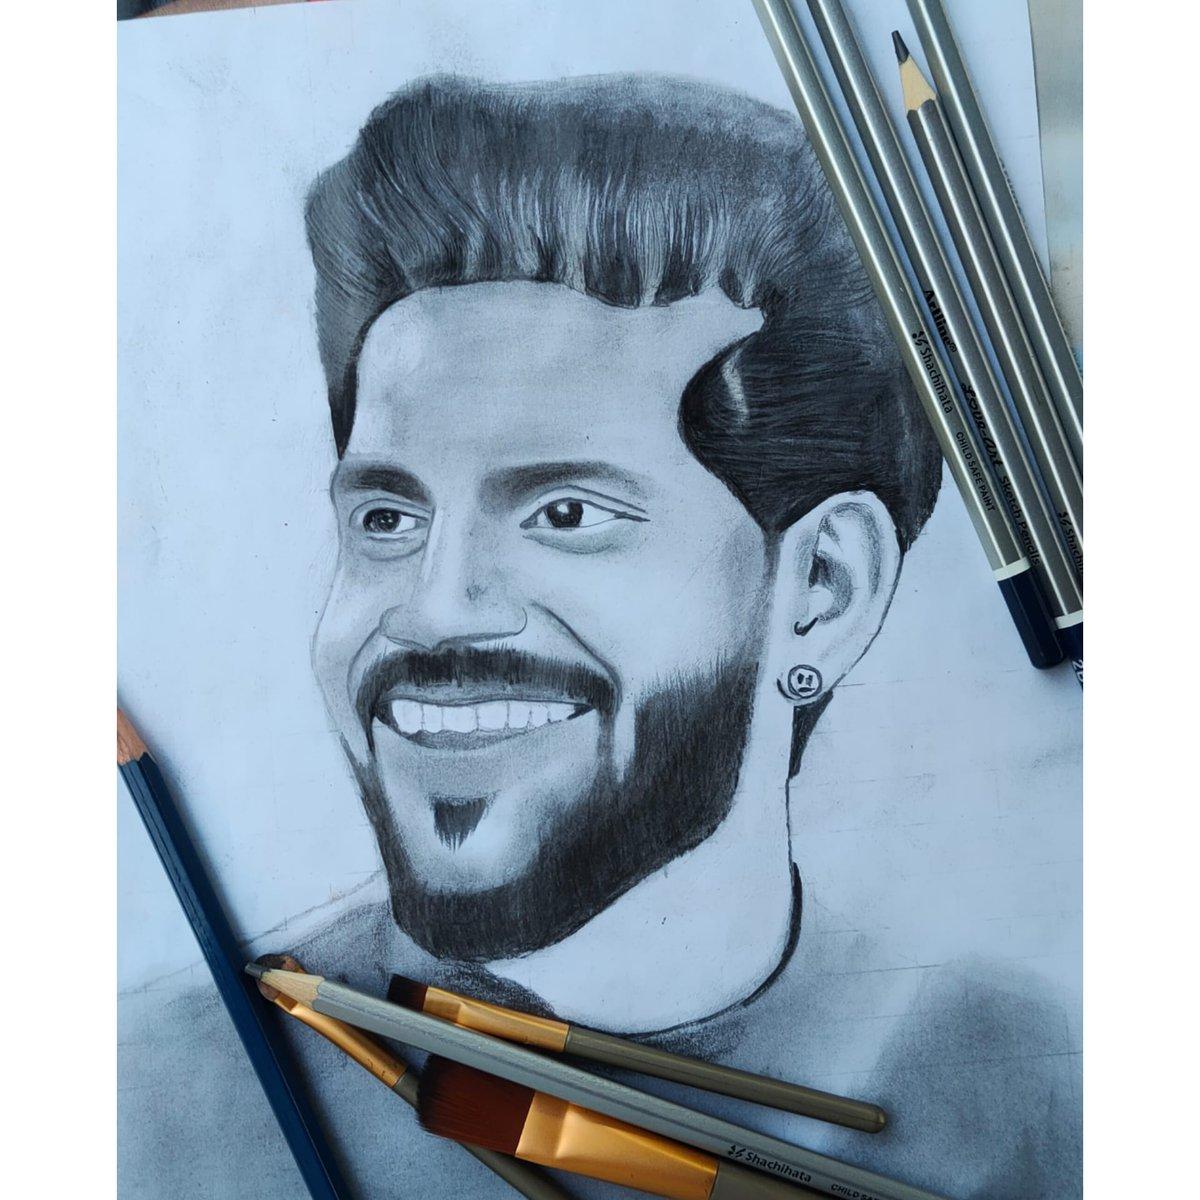 My drawing ✌️   #BalajiMurugaDoss  #balaji #artwork  #art  #pencil drawing #bigg boss #BiggBossTamil  #Instagram #artist